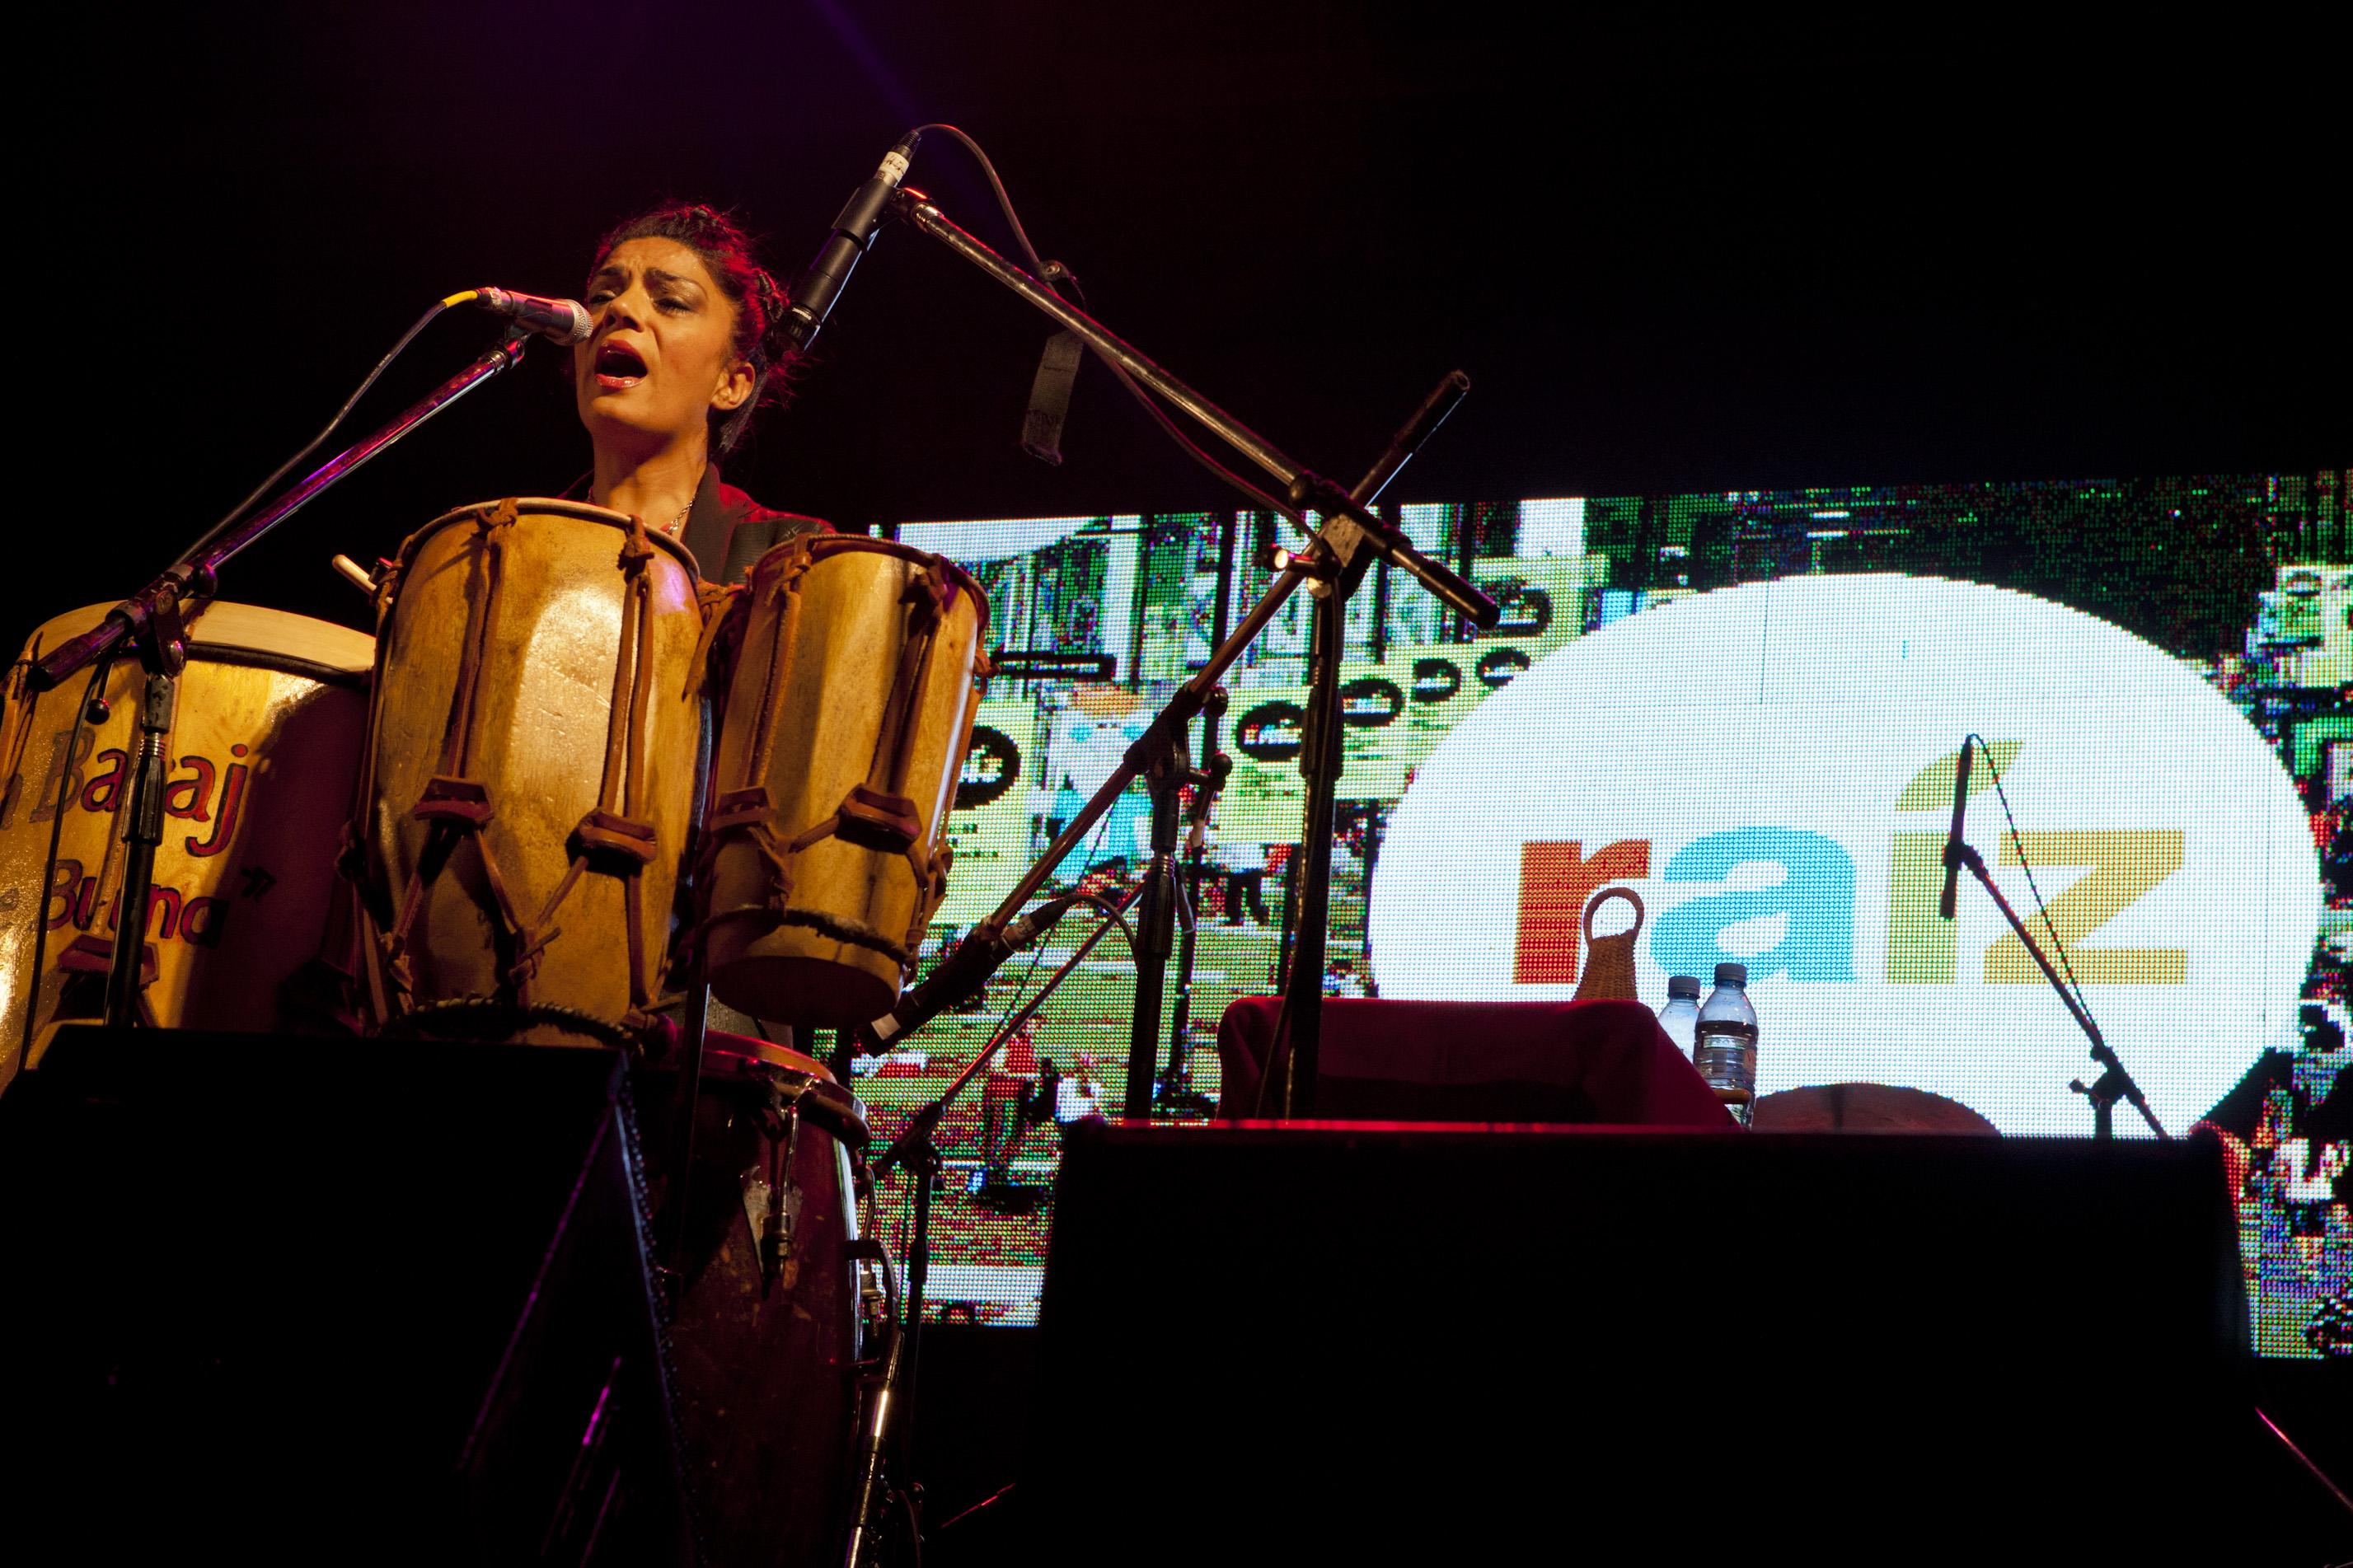 Mariana Baraj en un festival en Tecnópolis (Villa Martelli, 2 de noviembre de 2014).